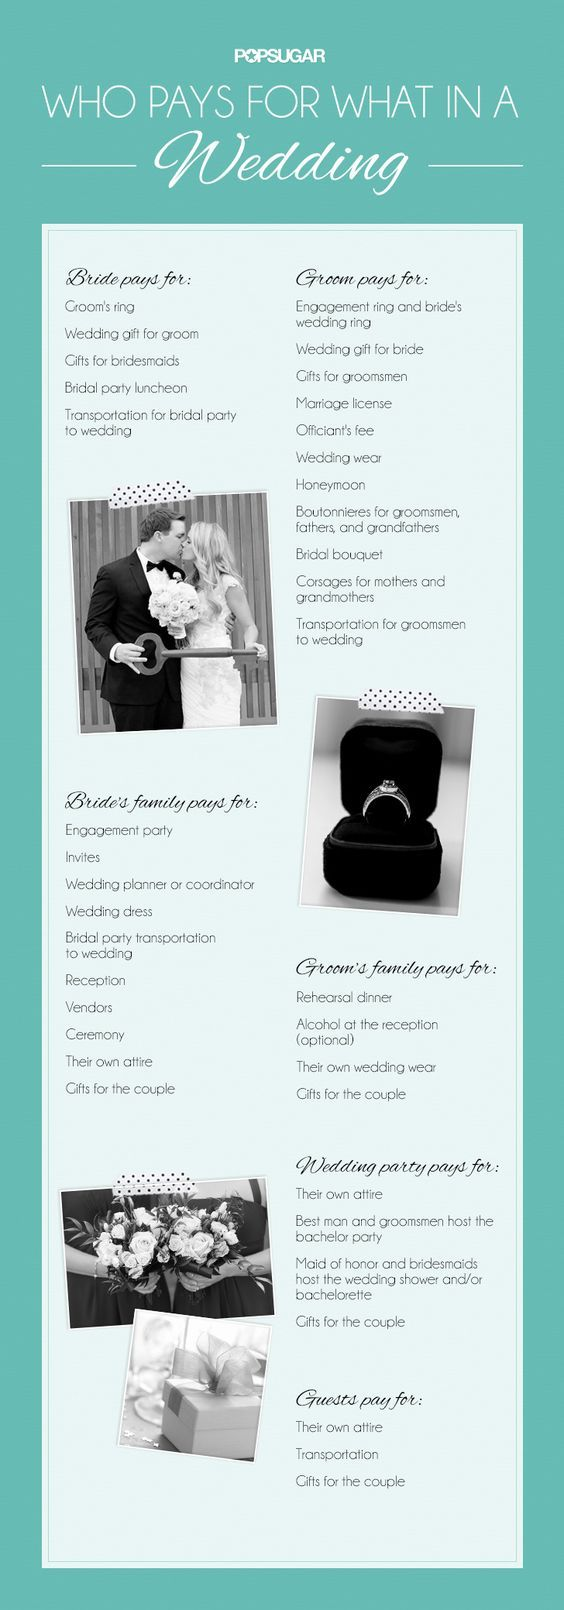 printable wedding checklist the knot